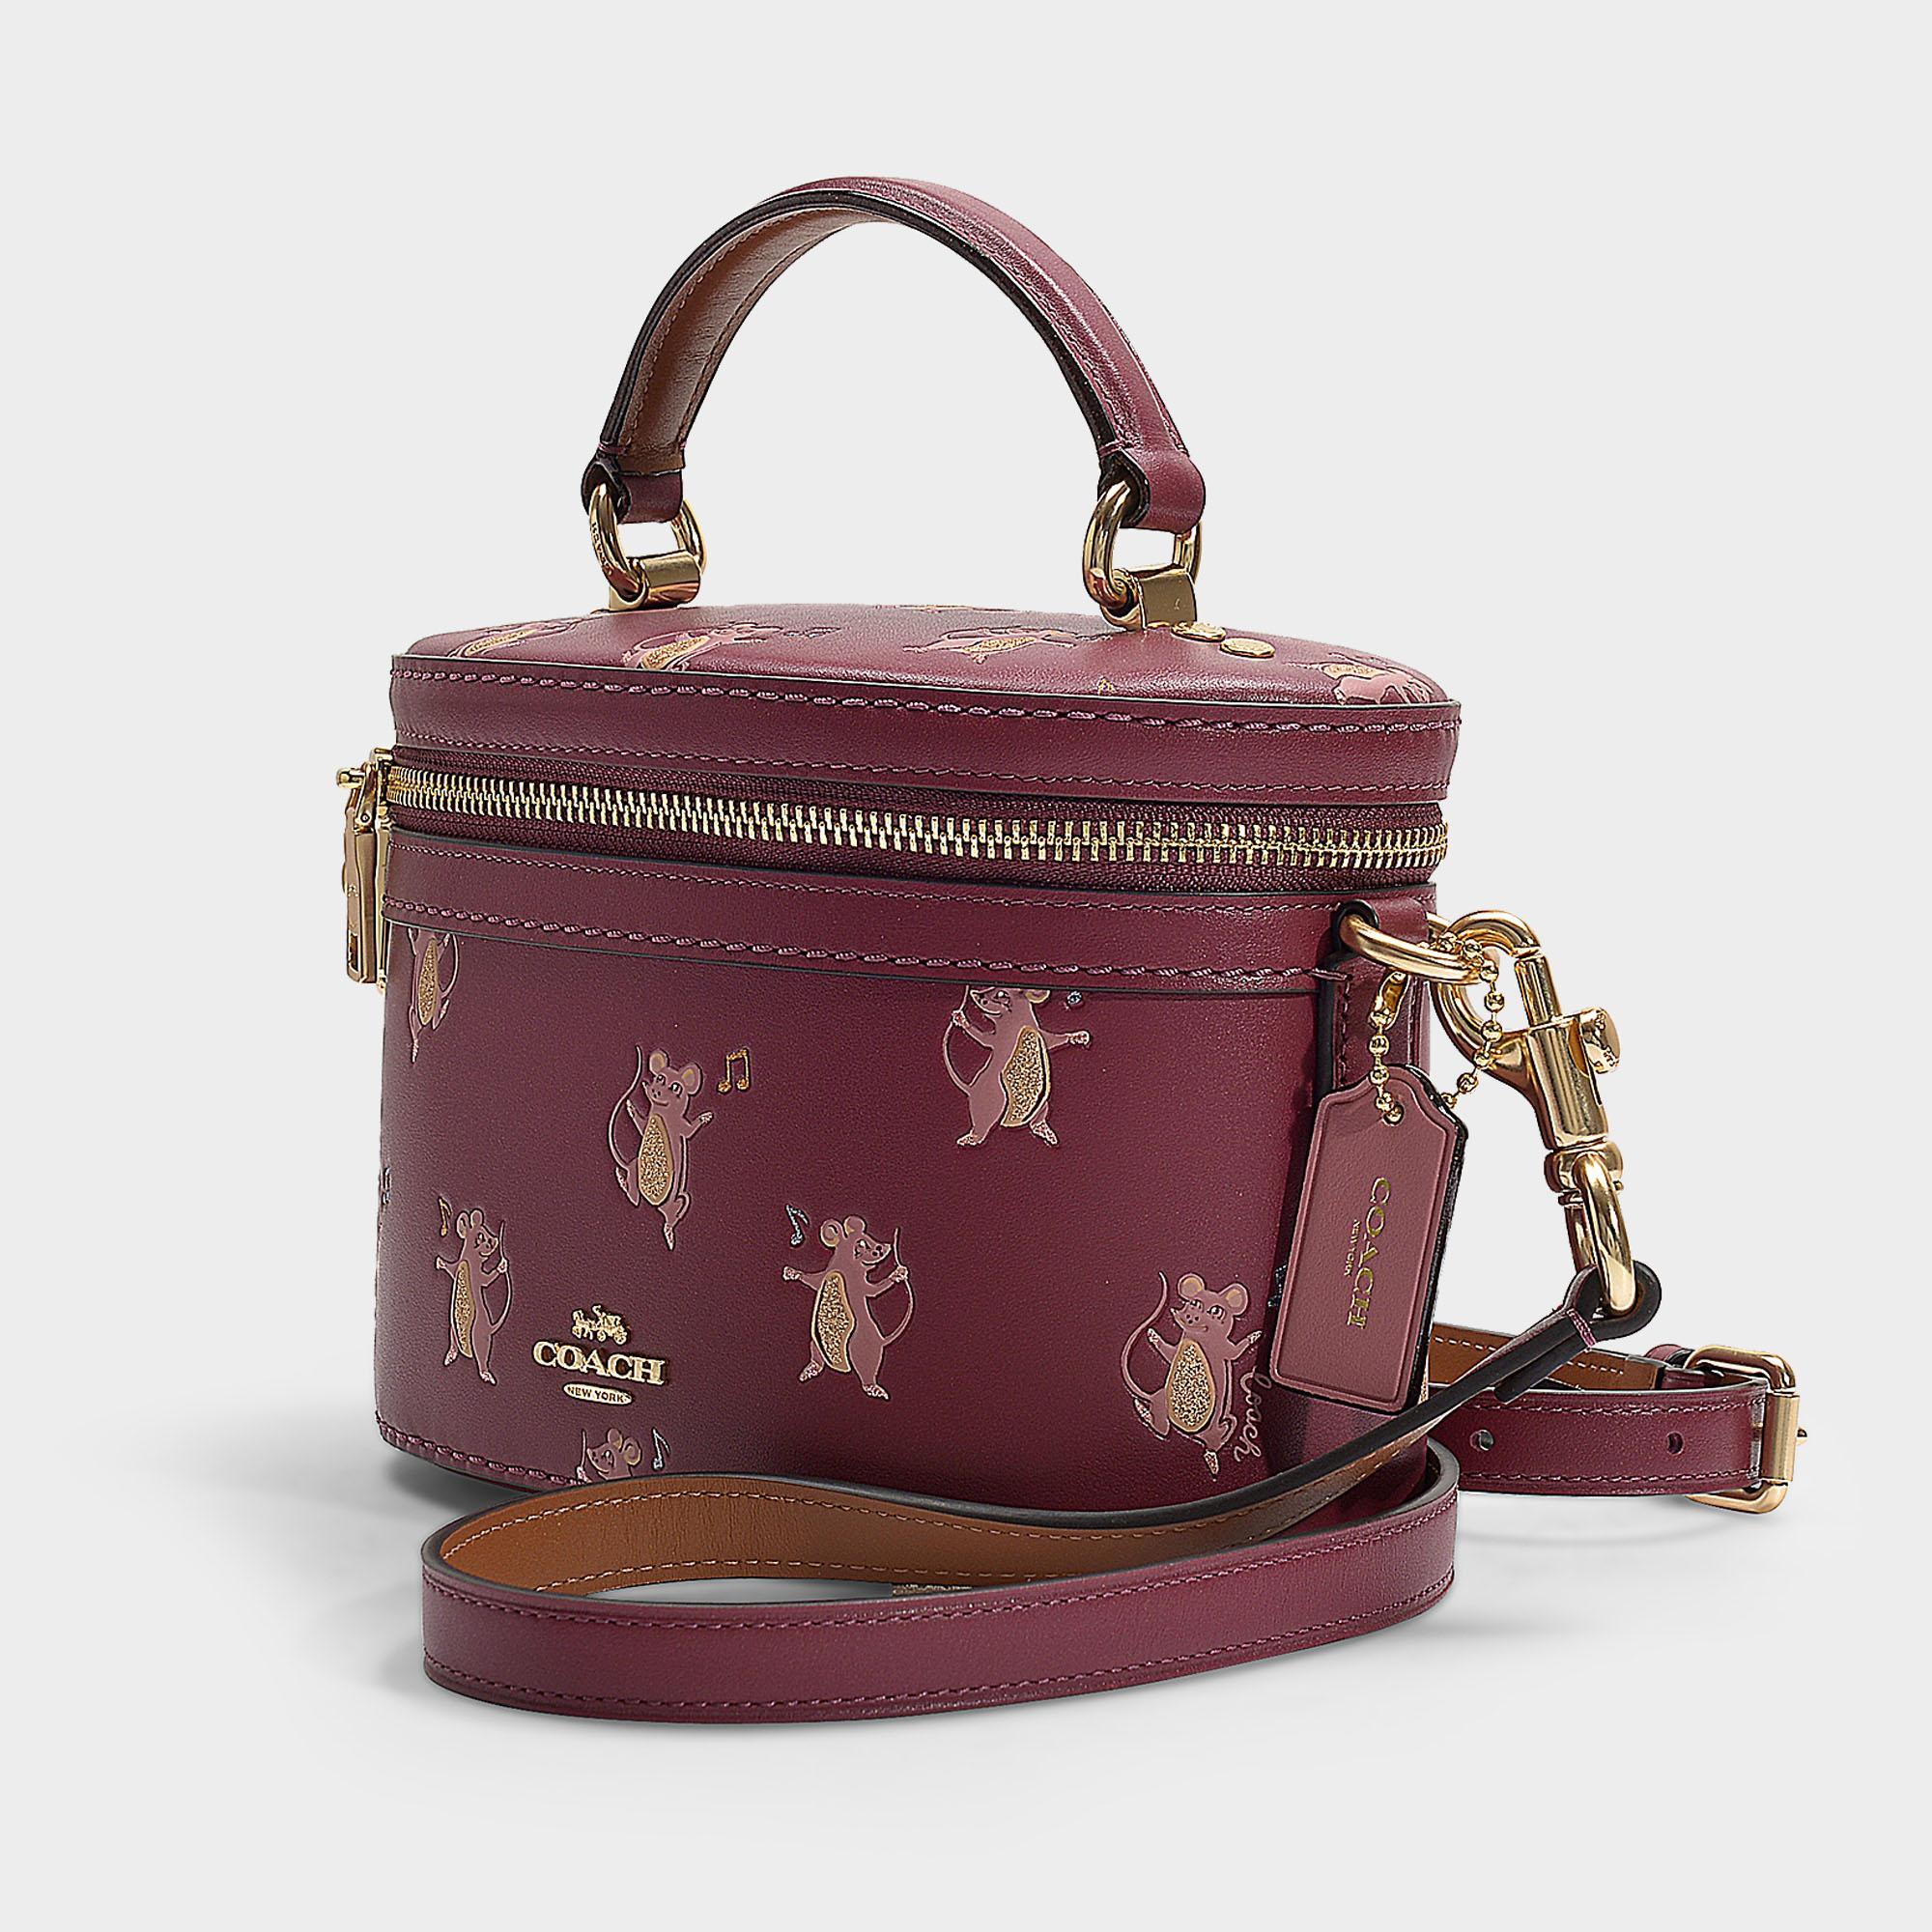 5287aa63e6b4 COACH Mouse Print Trail Crossbody In Burgundy Calfskin in Purple - Lyst